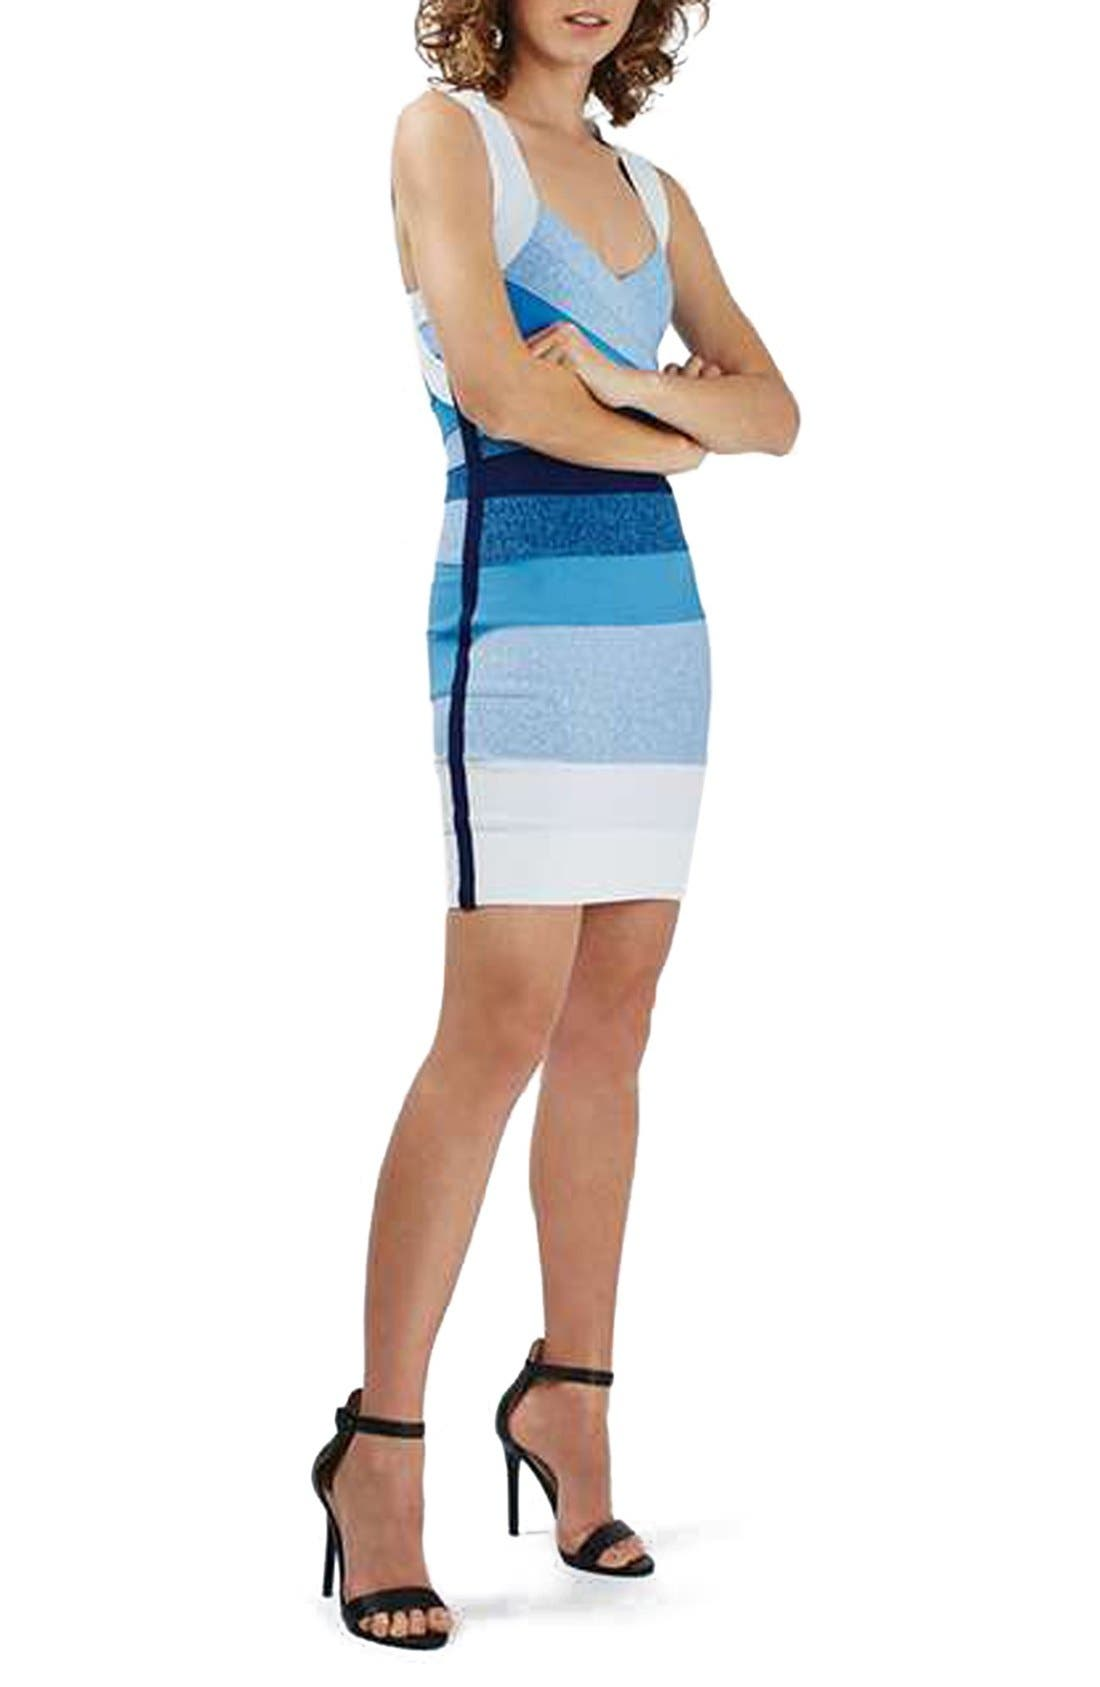 Alternate Image 1 Selected - Topshop Ombré Bandage Body-Con Dress